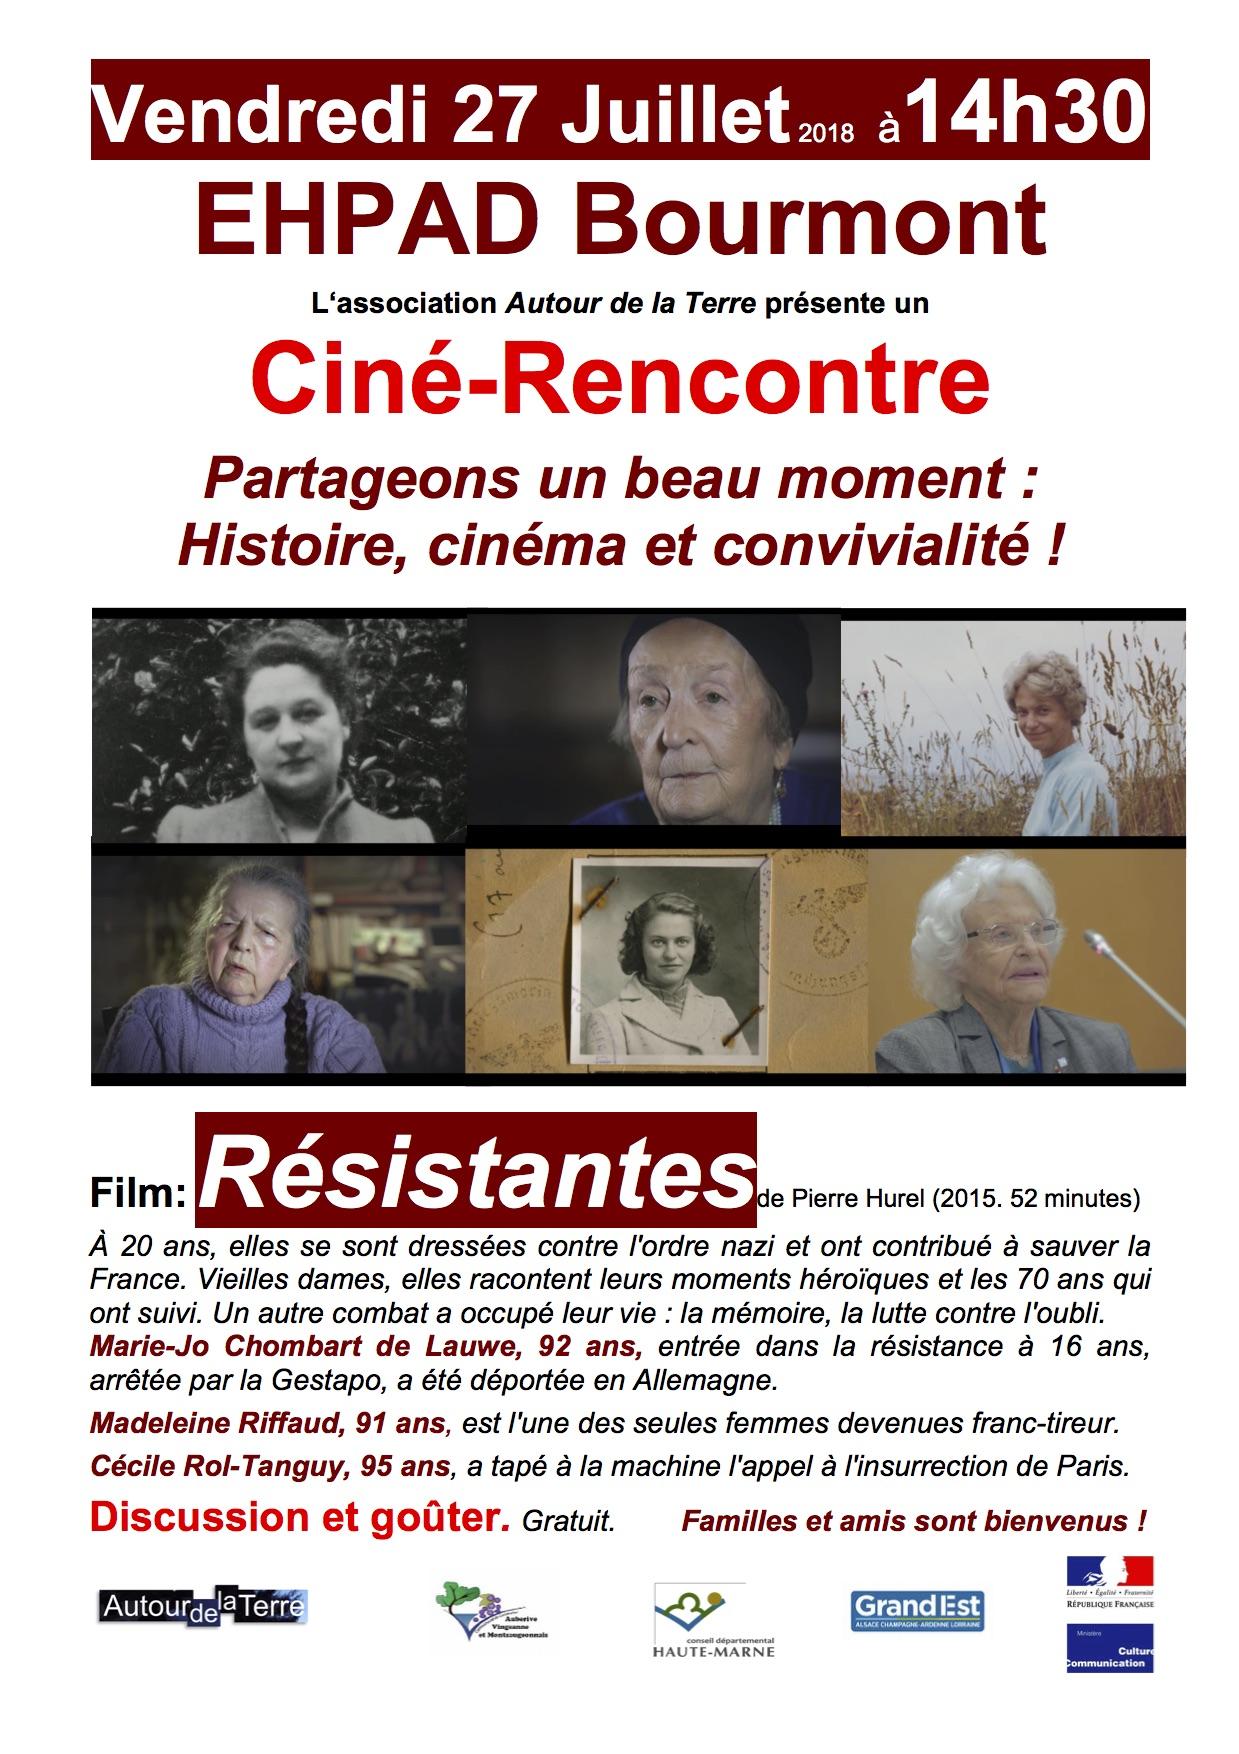 resistantes_bourmont_27_7_